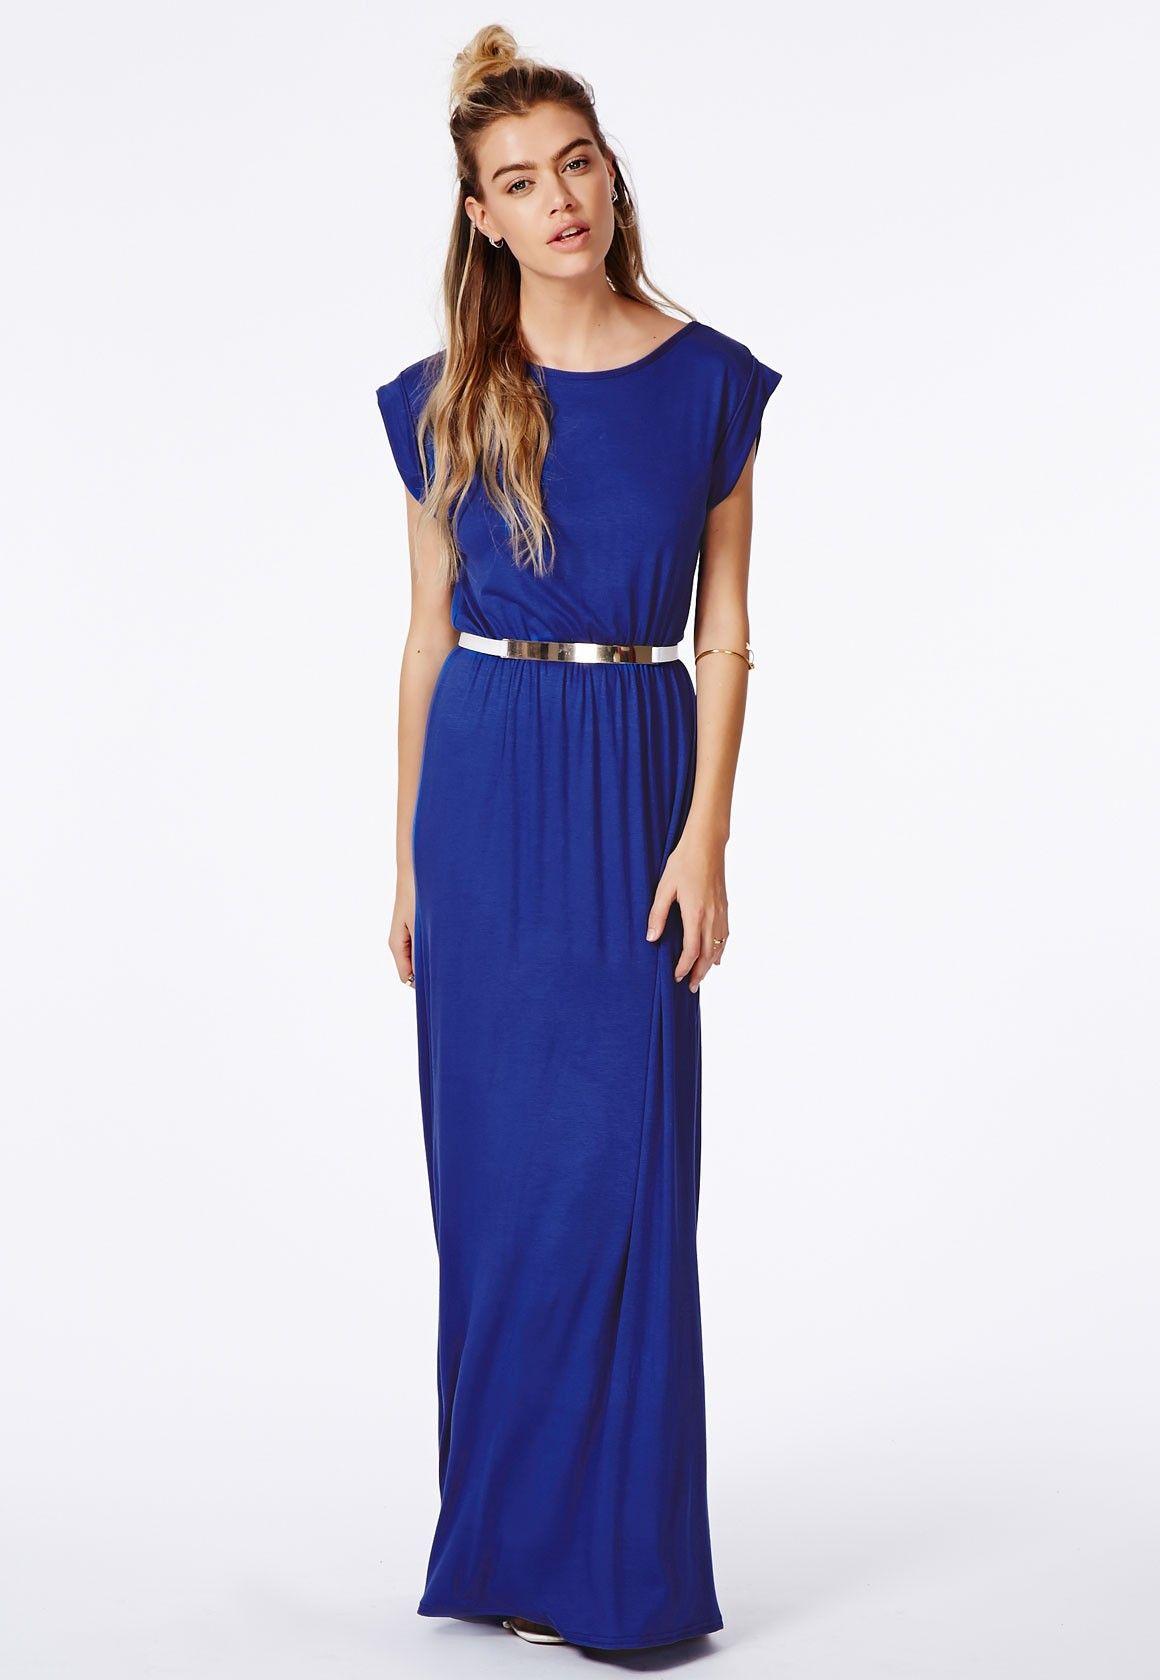 best-blue-maxi-dresses | Blue Maxi Dress | Pinterest | Blue maxi ...